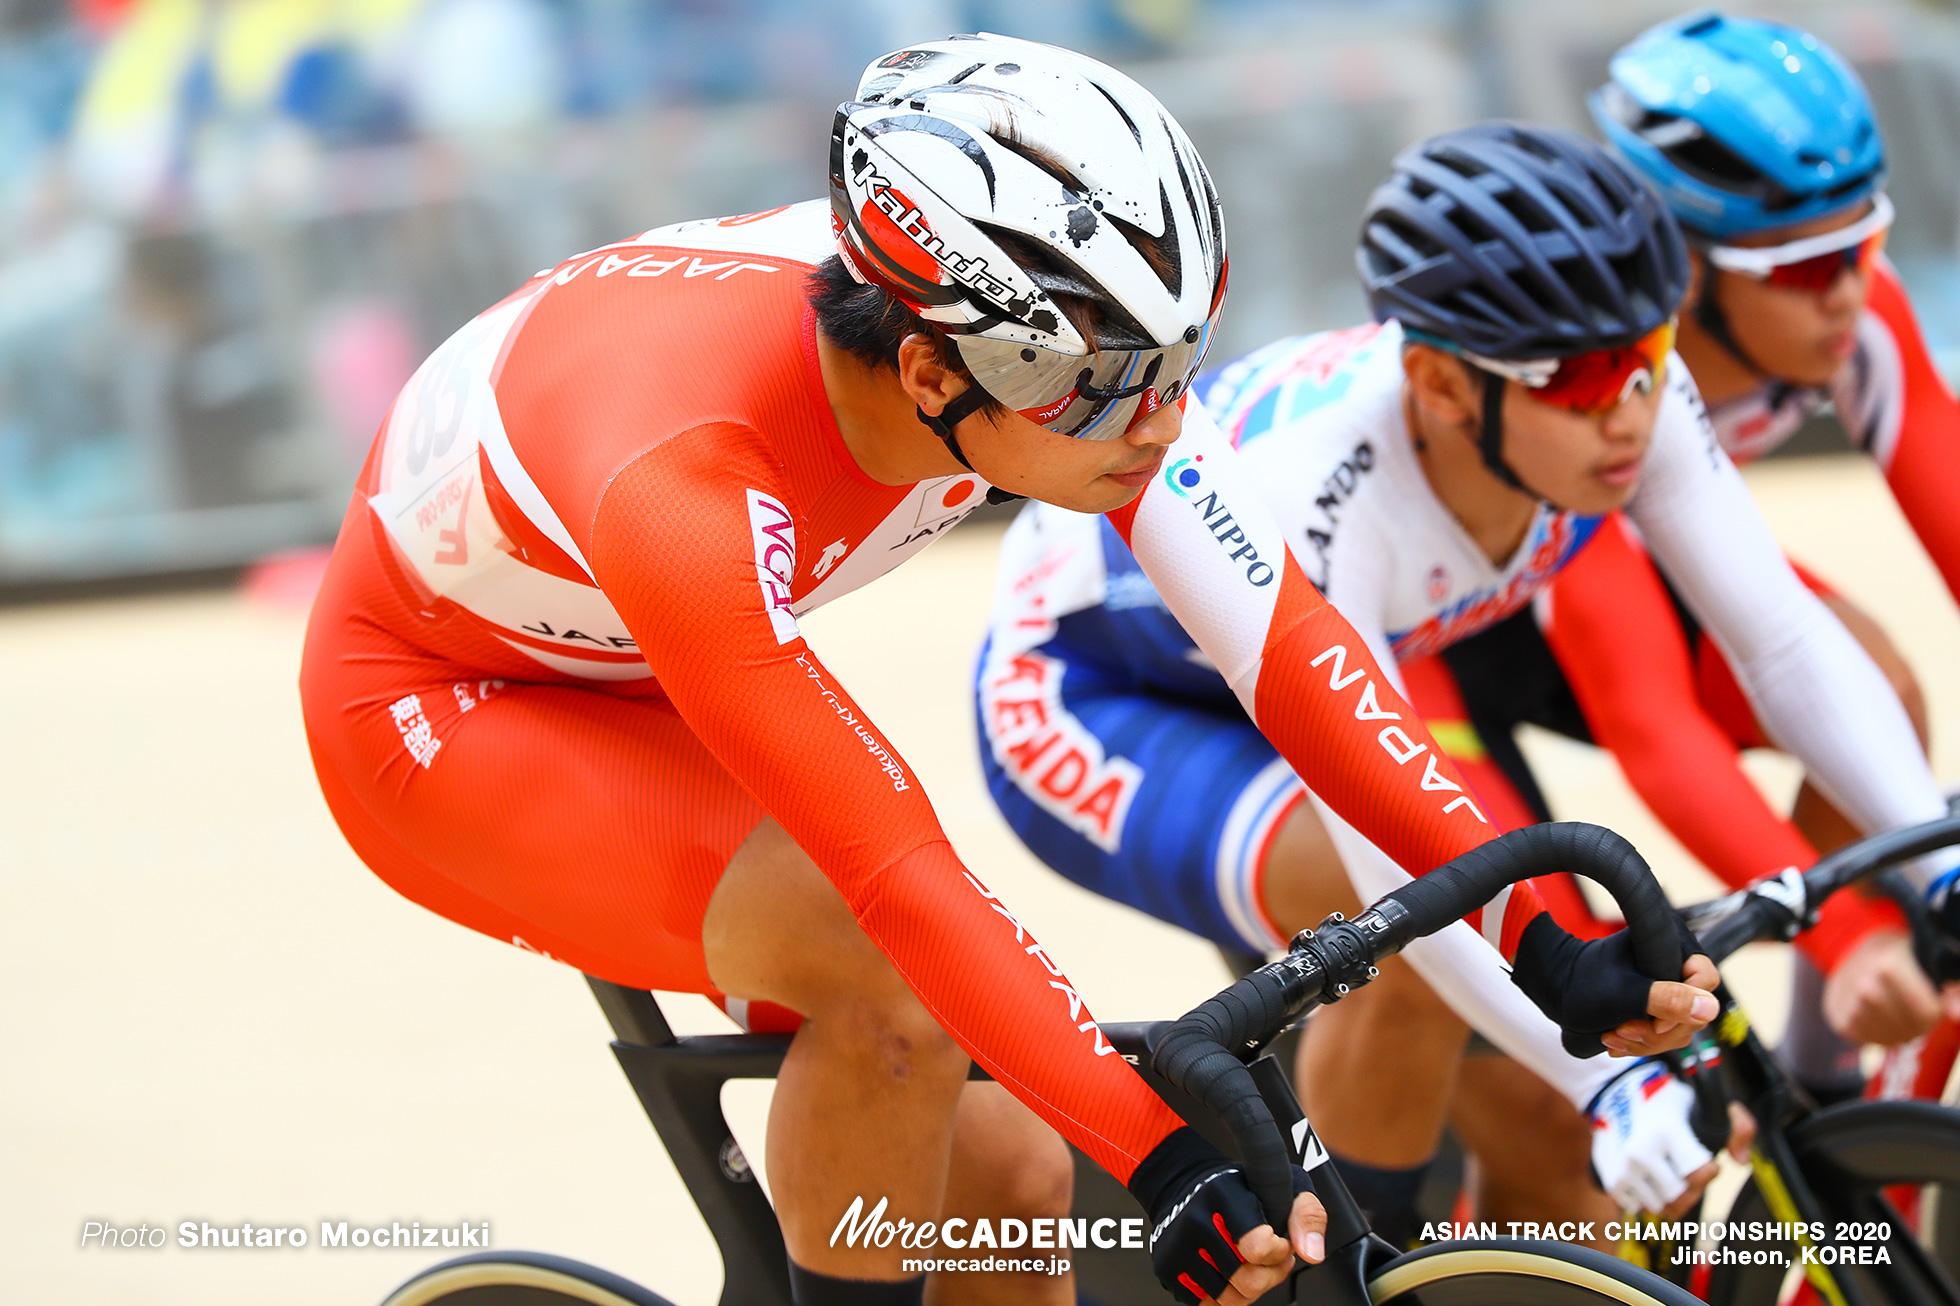 Scratch Race / Men Omnium / ASIAN TRACK CHAMPIONSHIPS 2020